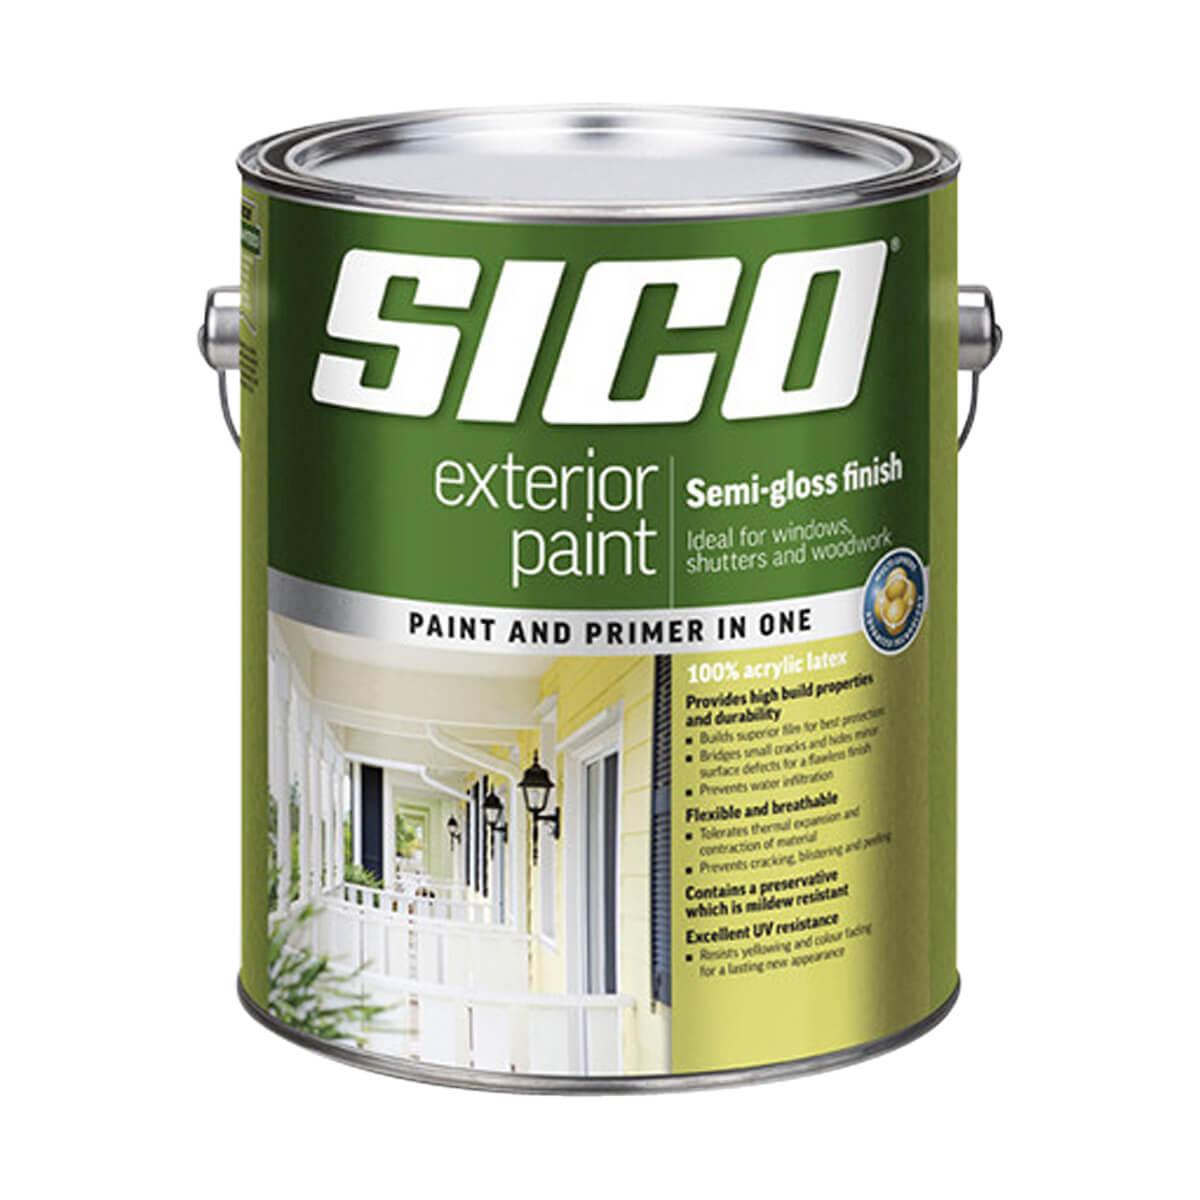 SICO Exterior Paint - Acylic - Semi-gloss Series 817 - White Base - 3.78L